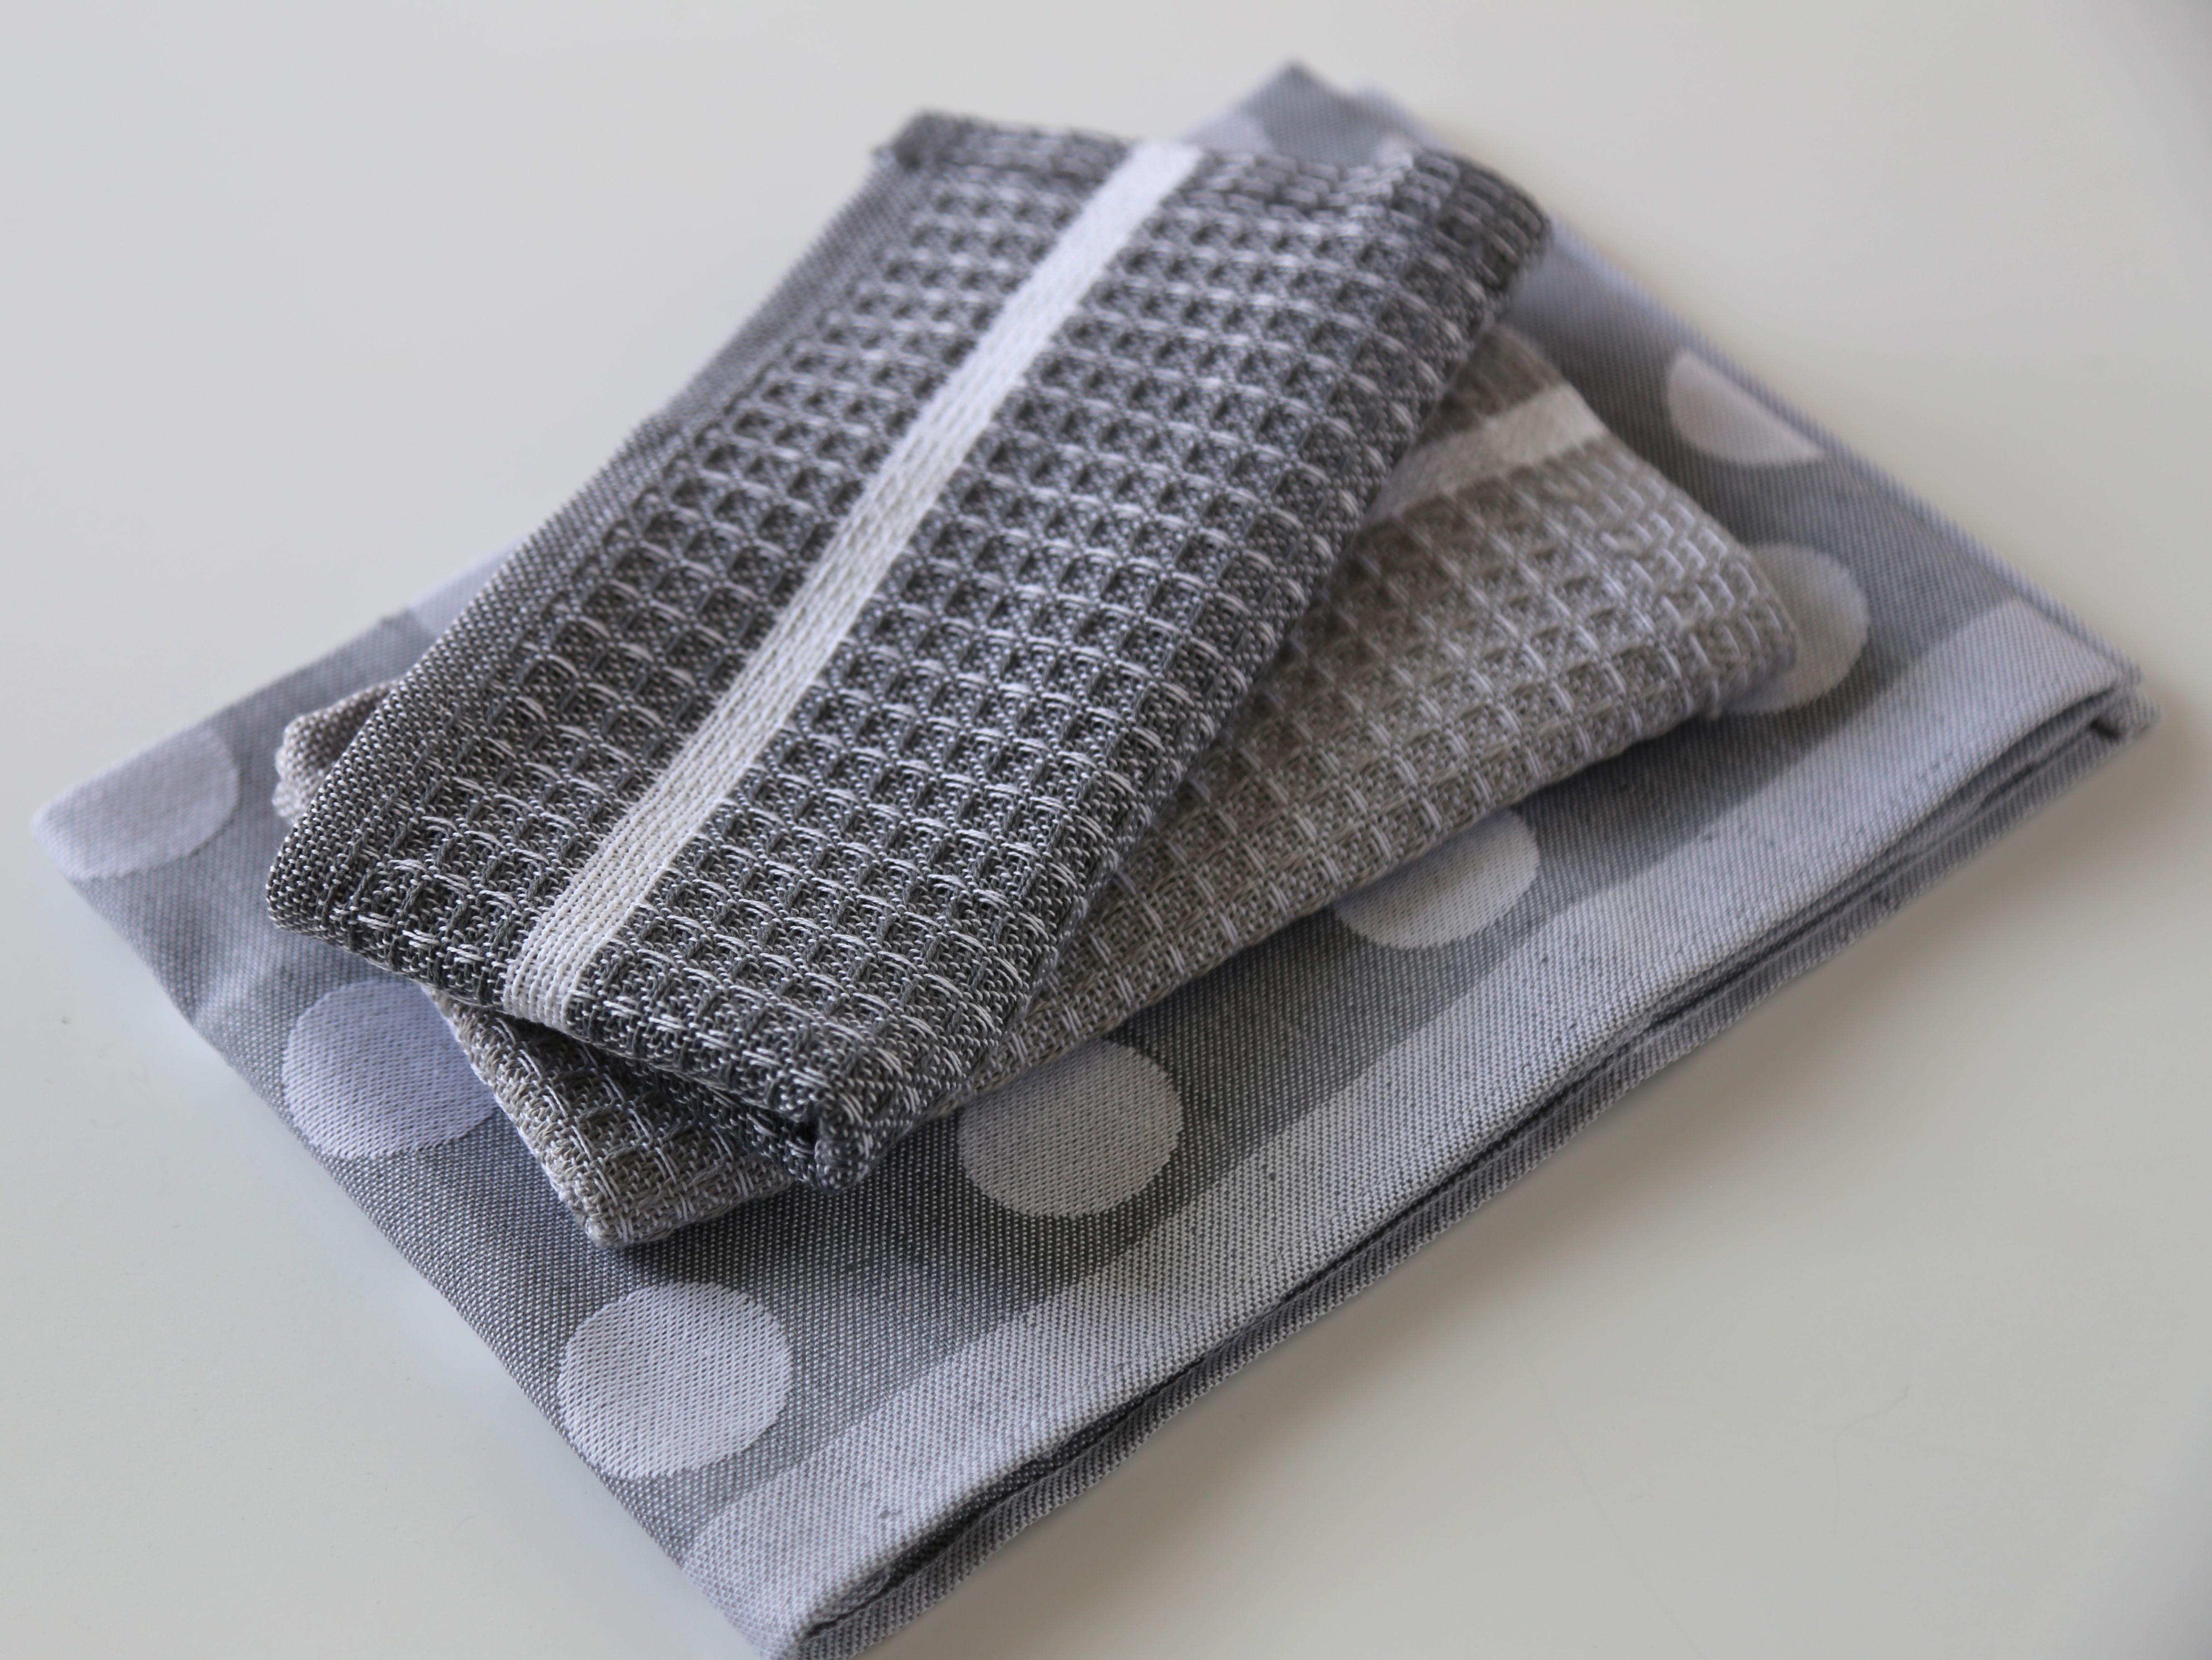 geschirrtuch und sp llappen produkte bei kochkultur pinterest. Black Bedroom Furniture Sets. Home Design Ideas